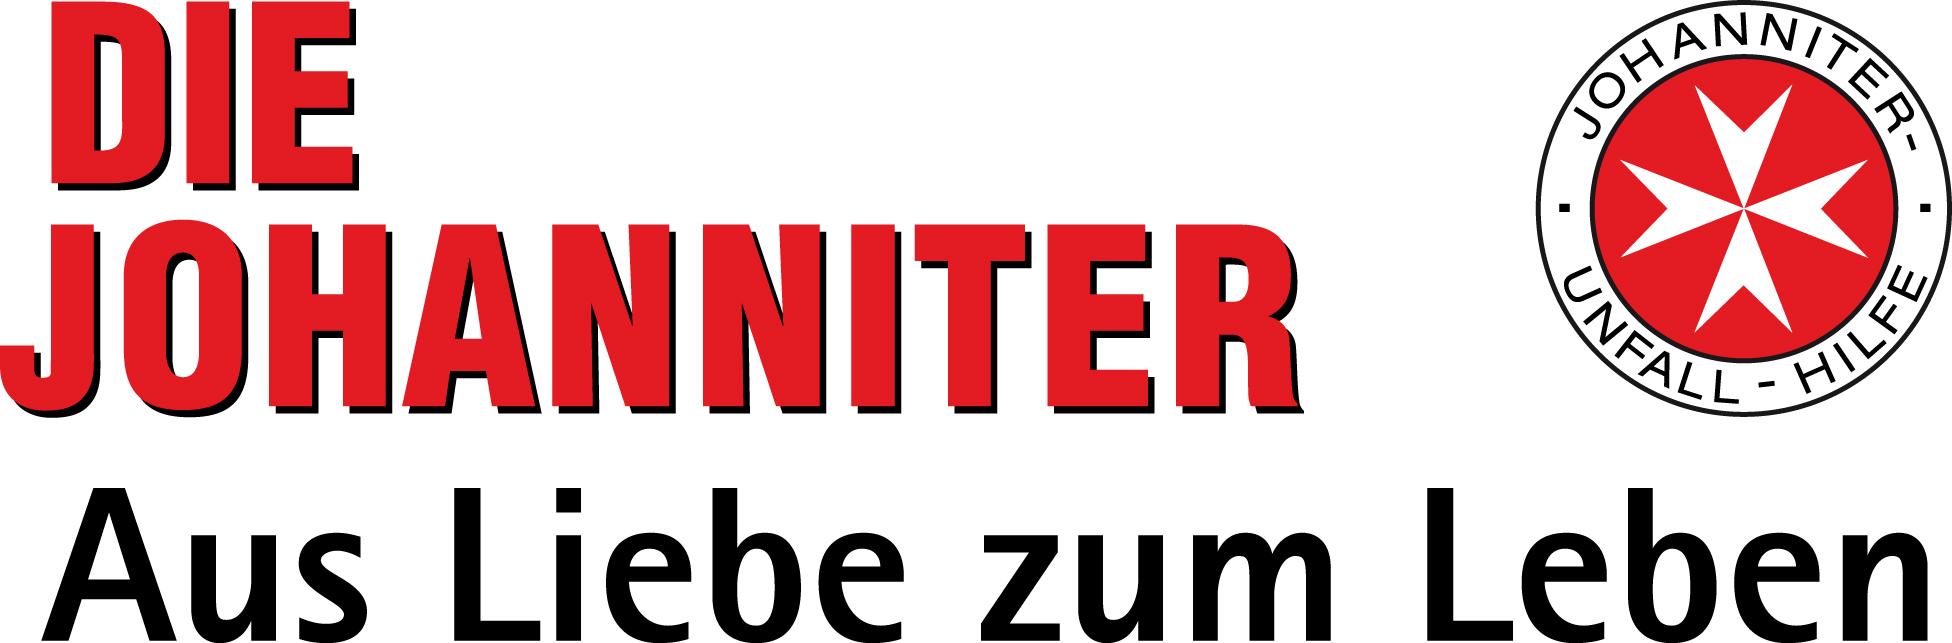 Johanniter-Unfall-Hilfe e. V., Regionalverband Weser-Ems